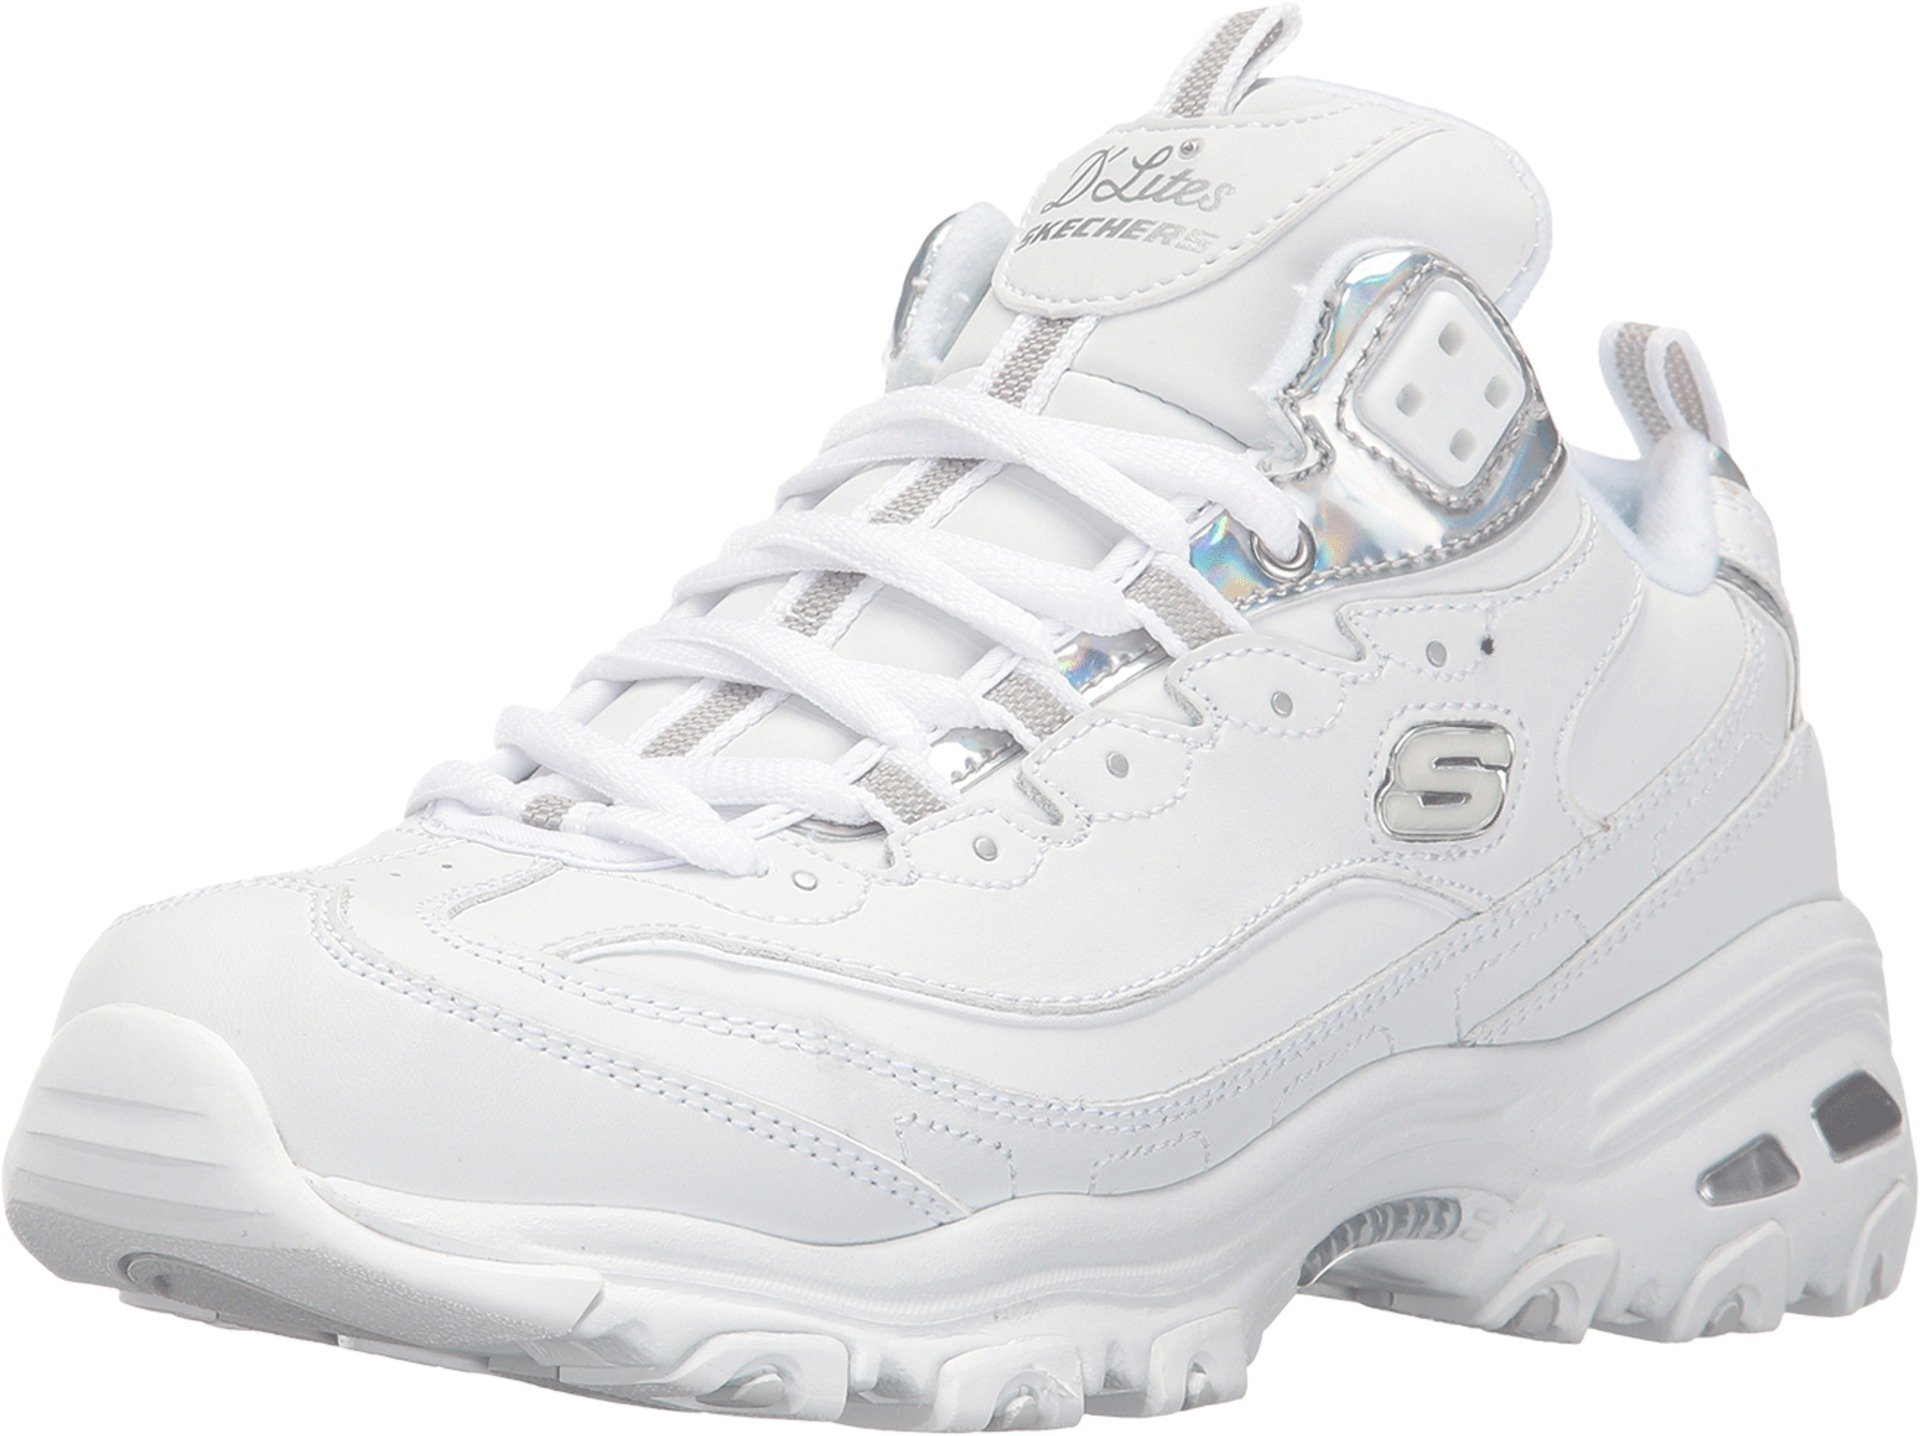 Skechers Women's D'Lites - Style Rethink White/Silver Sneaker 9.5 B (M)